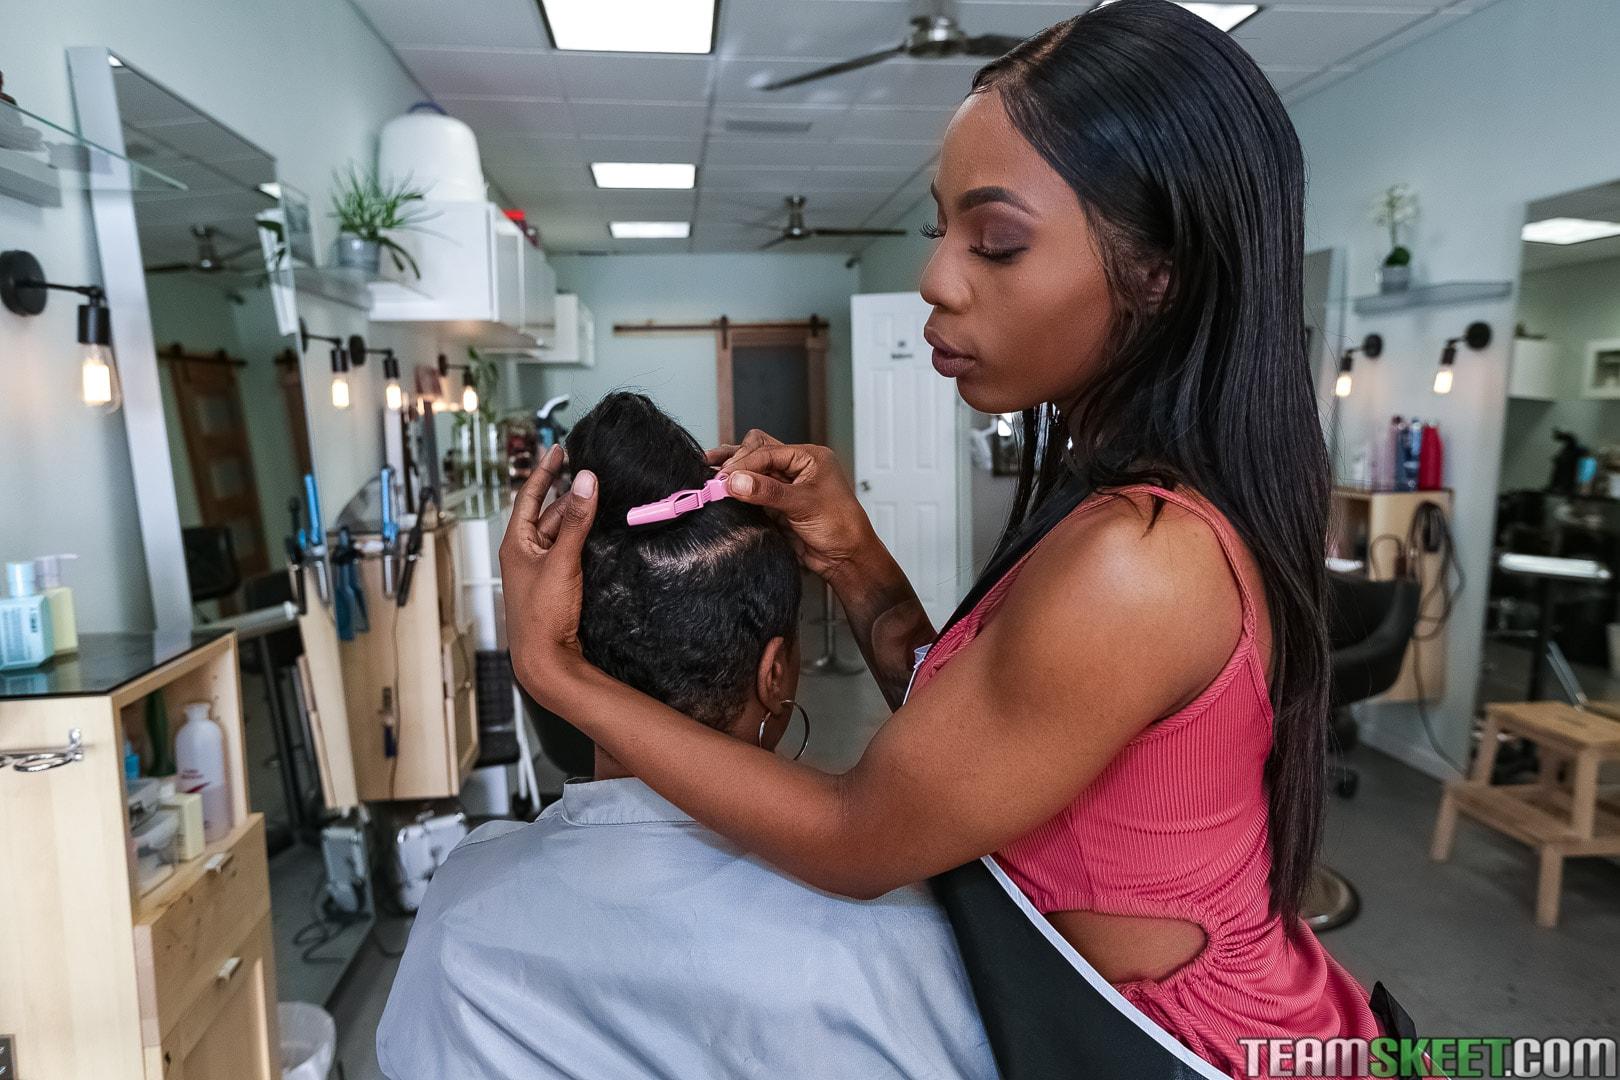 Team Skeet 'Full Service Hair Salon' starring Sabina Rouge (Photo 91)